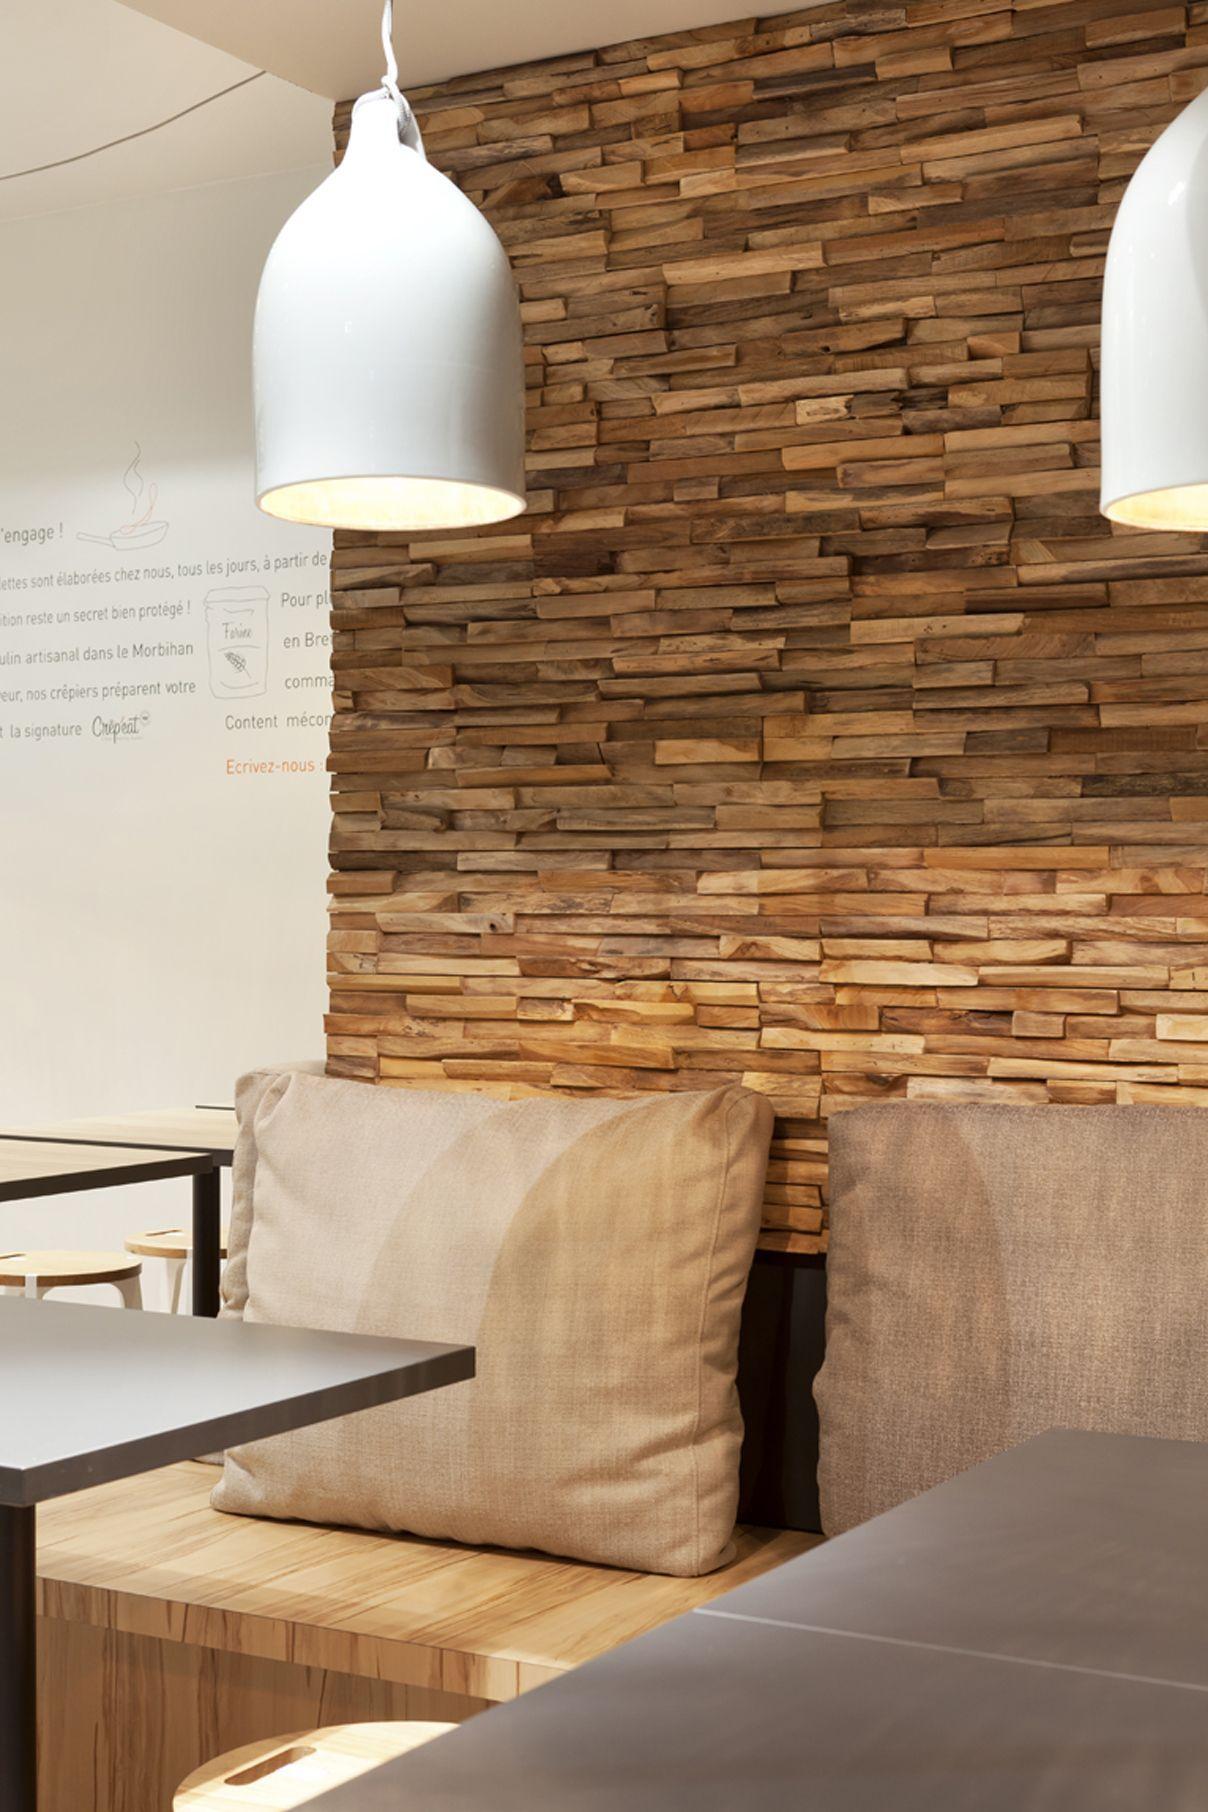 Wandverkleidung Holz Wandverkleidung Holz Wandverkleidung Holz In 2020 Holzwand Wandverkleidung Holz Innen Holzpaneele